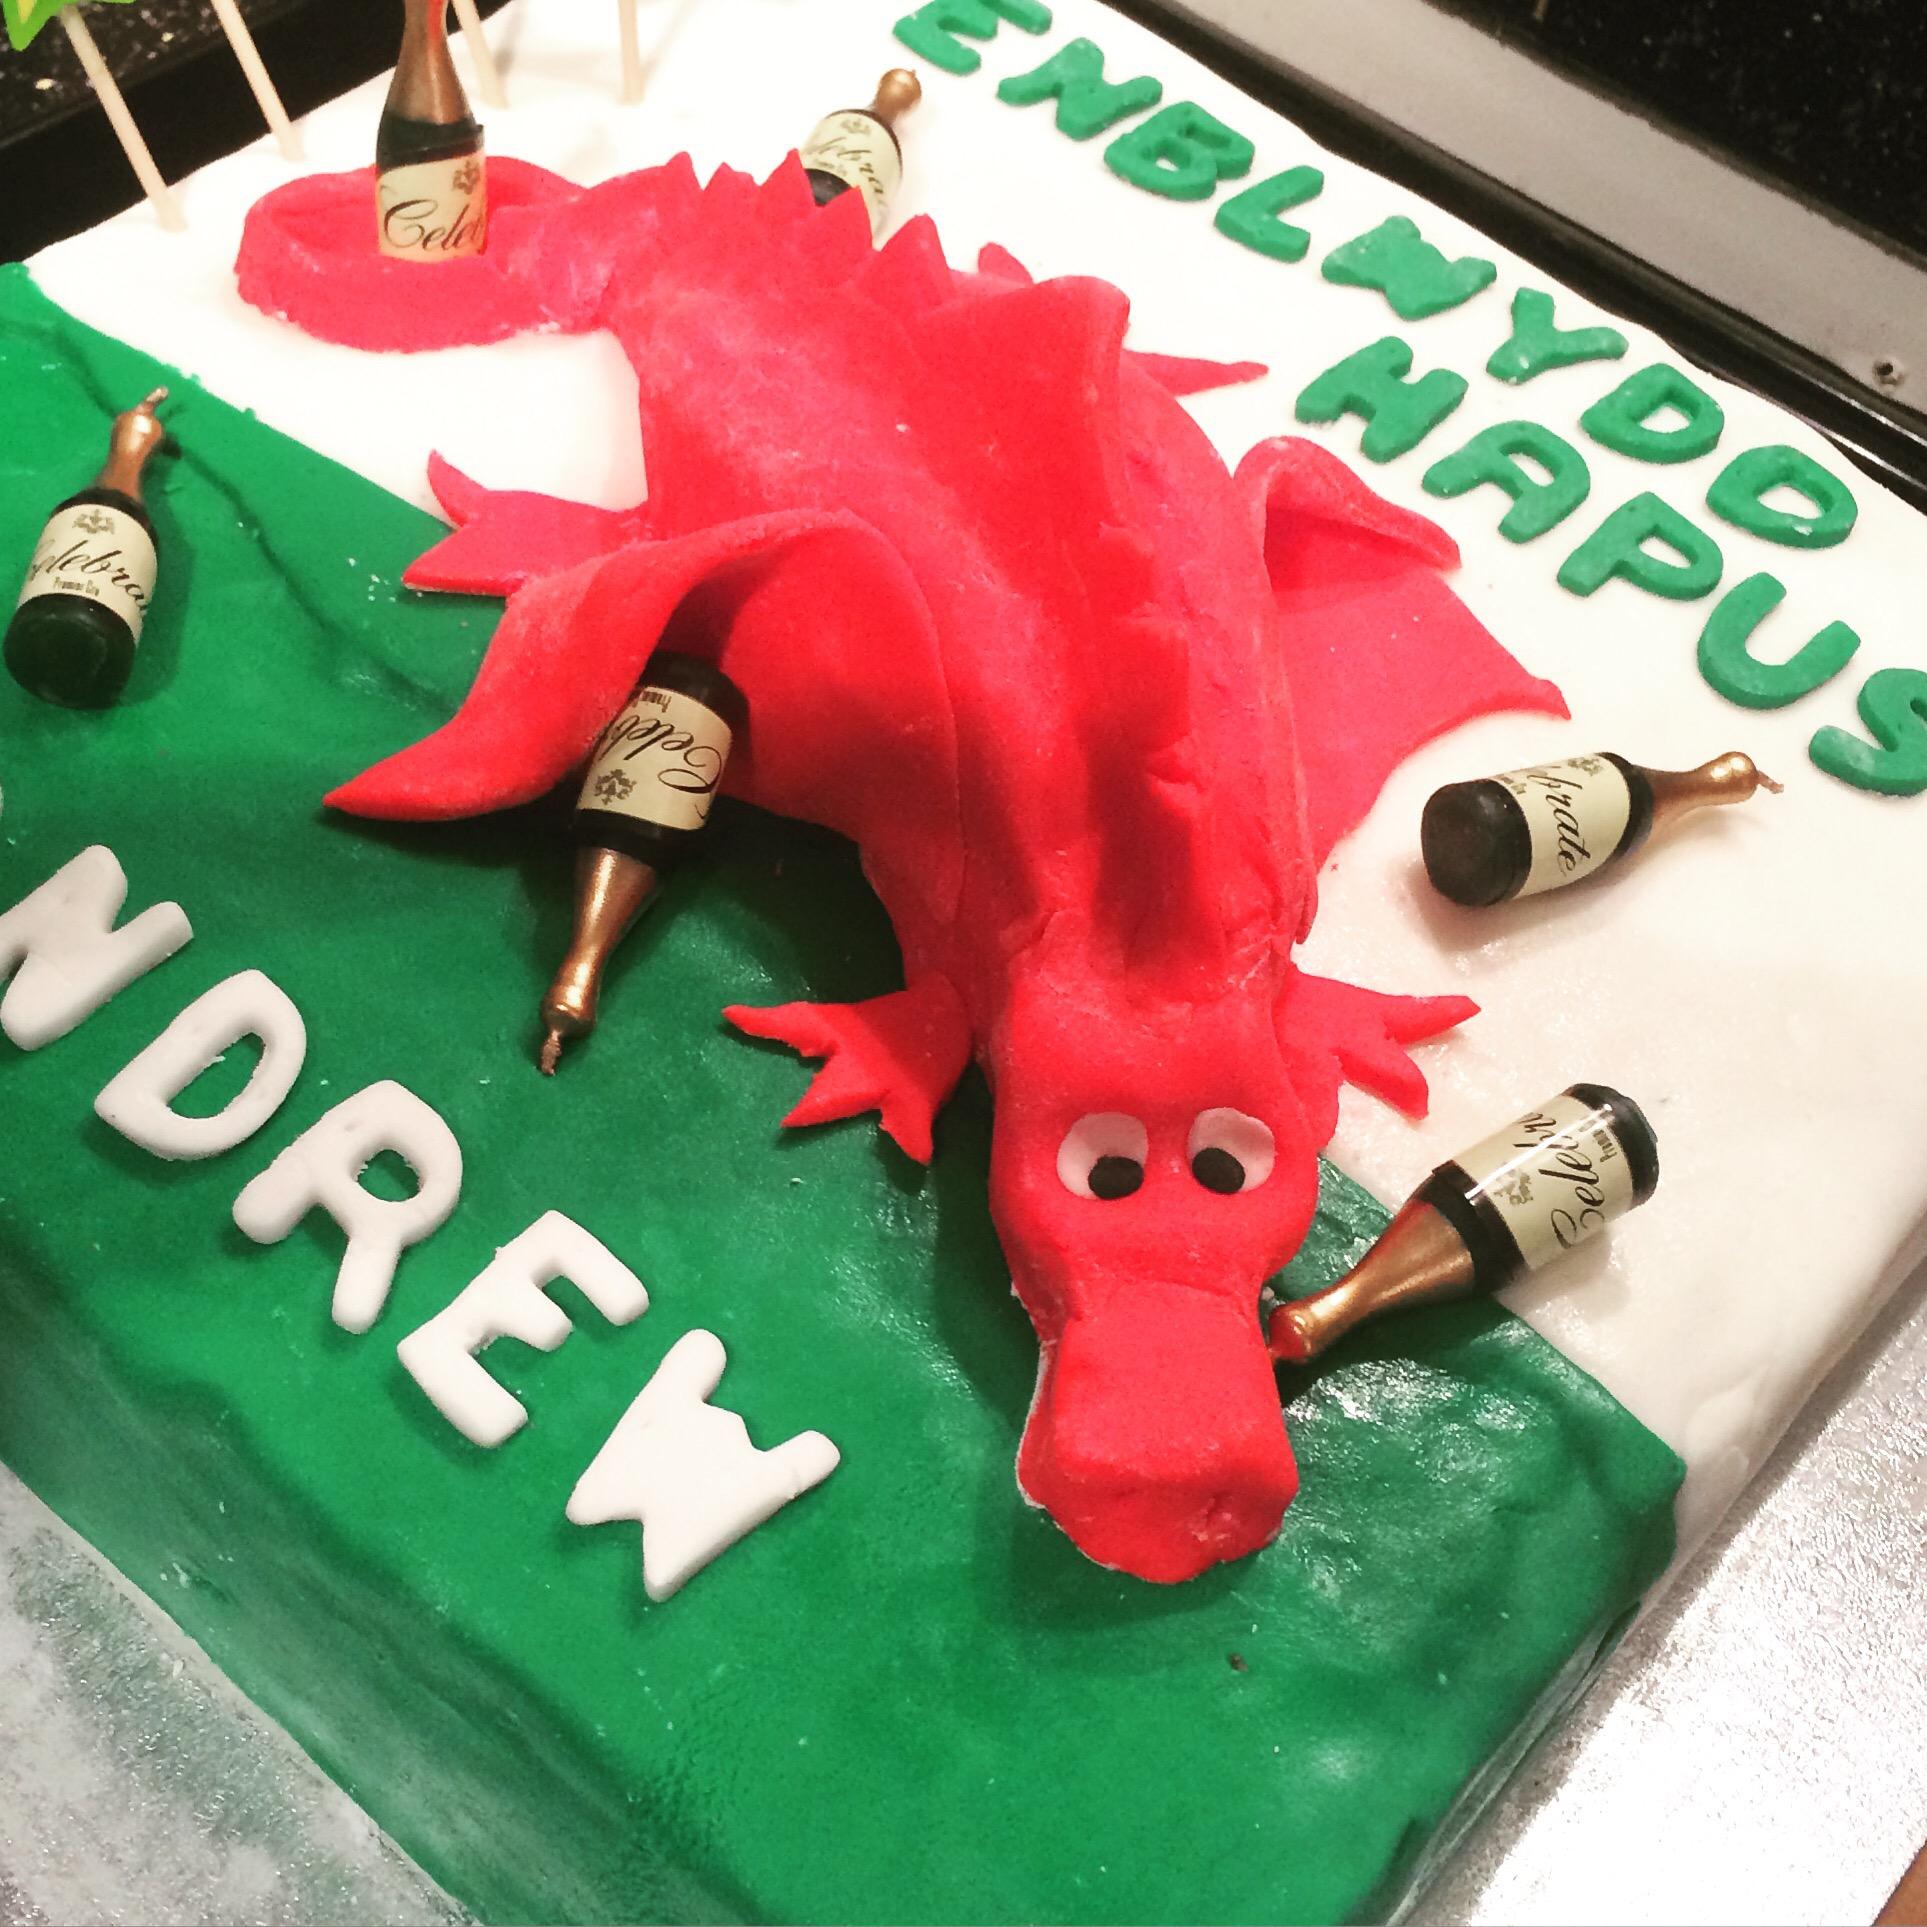 Pleasant 40Th Birthday Cake Drunken Welsh Dragon Vanilla Cake Its Not Funny Birthday Cards Online Alyptdamsfinfo